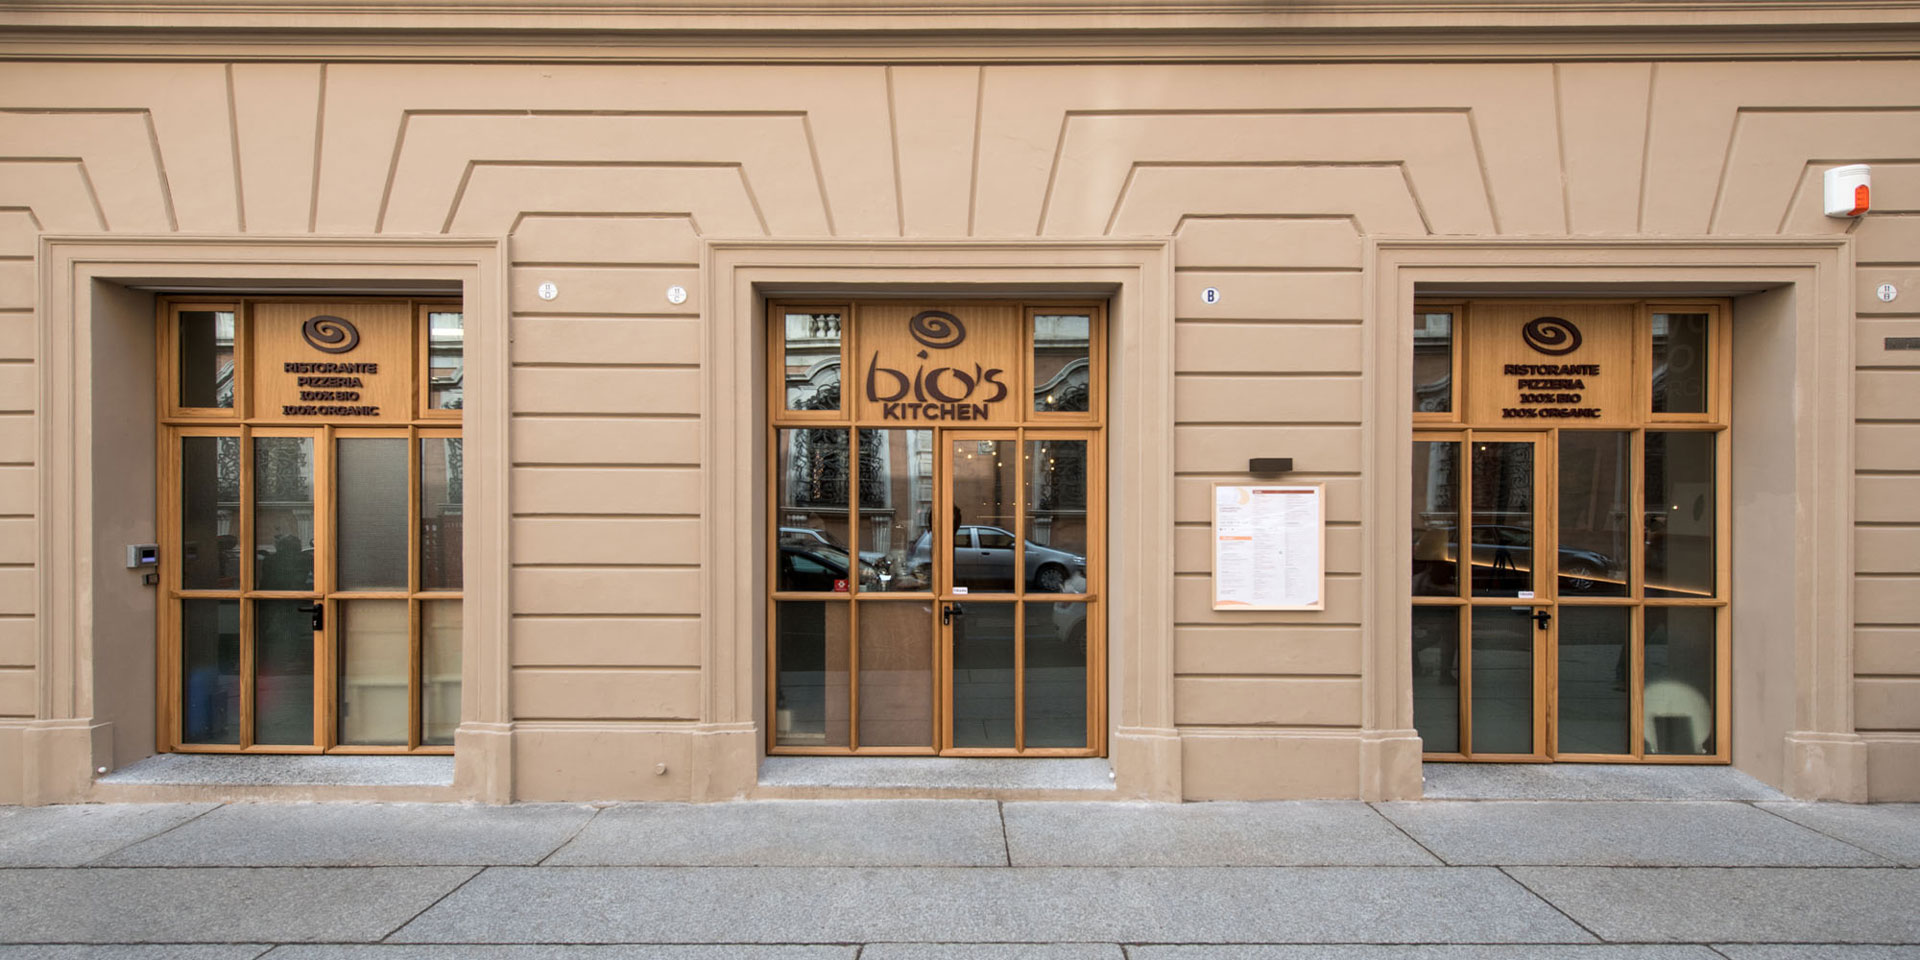 archinow_BOB_new-restaurant_03